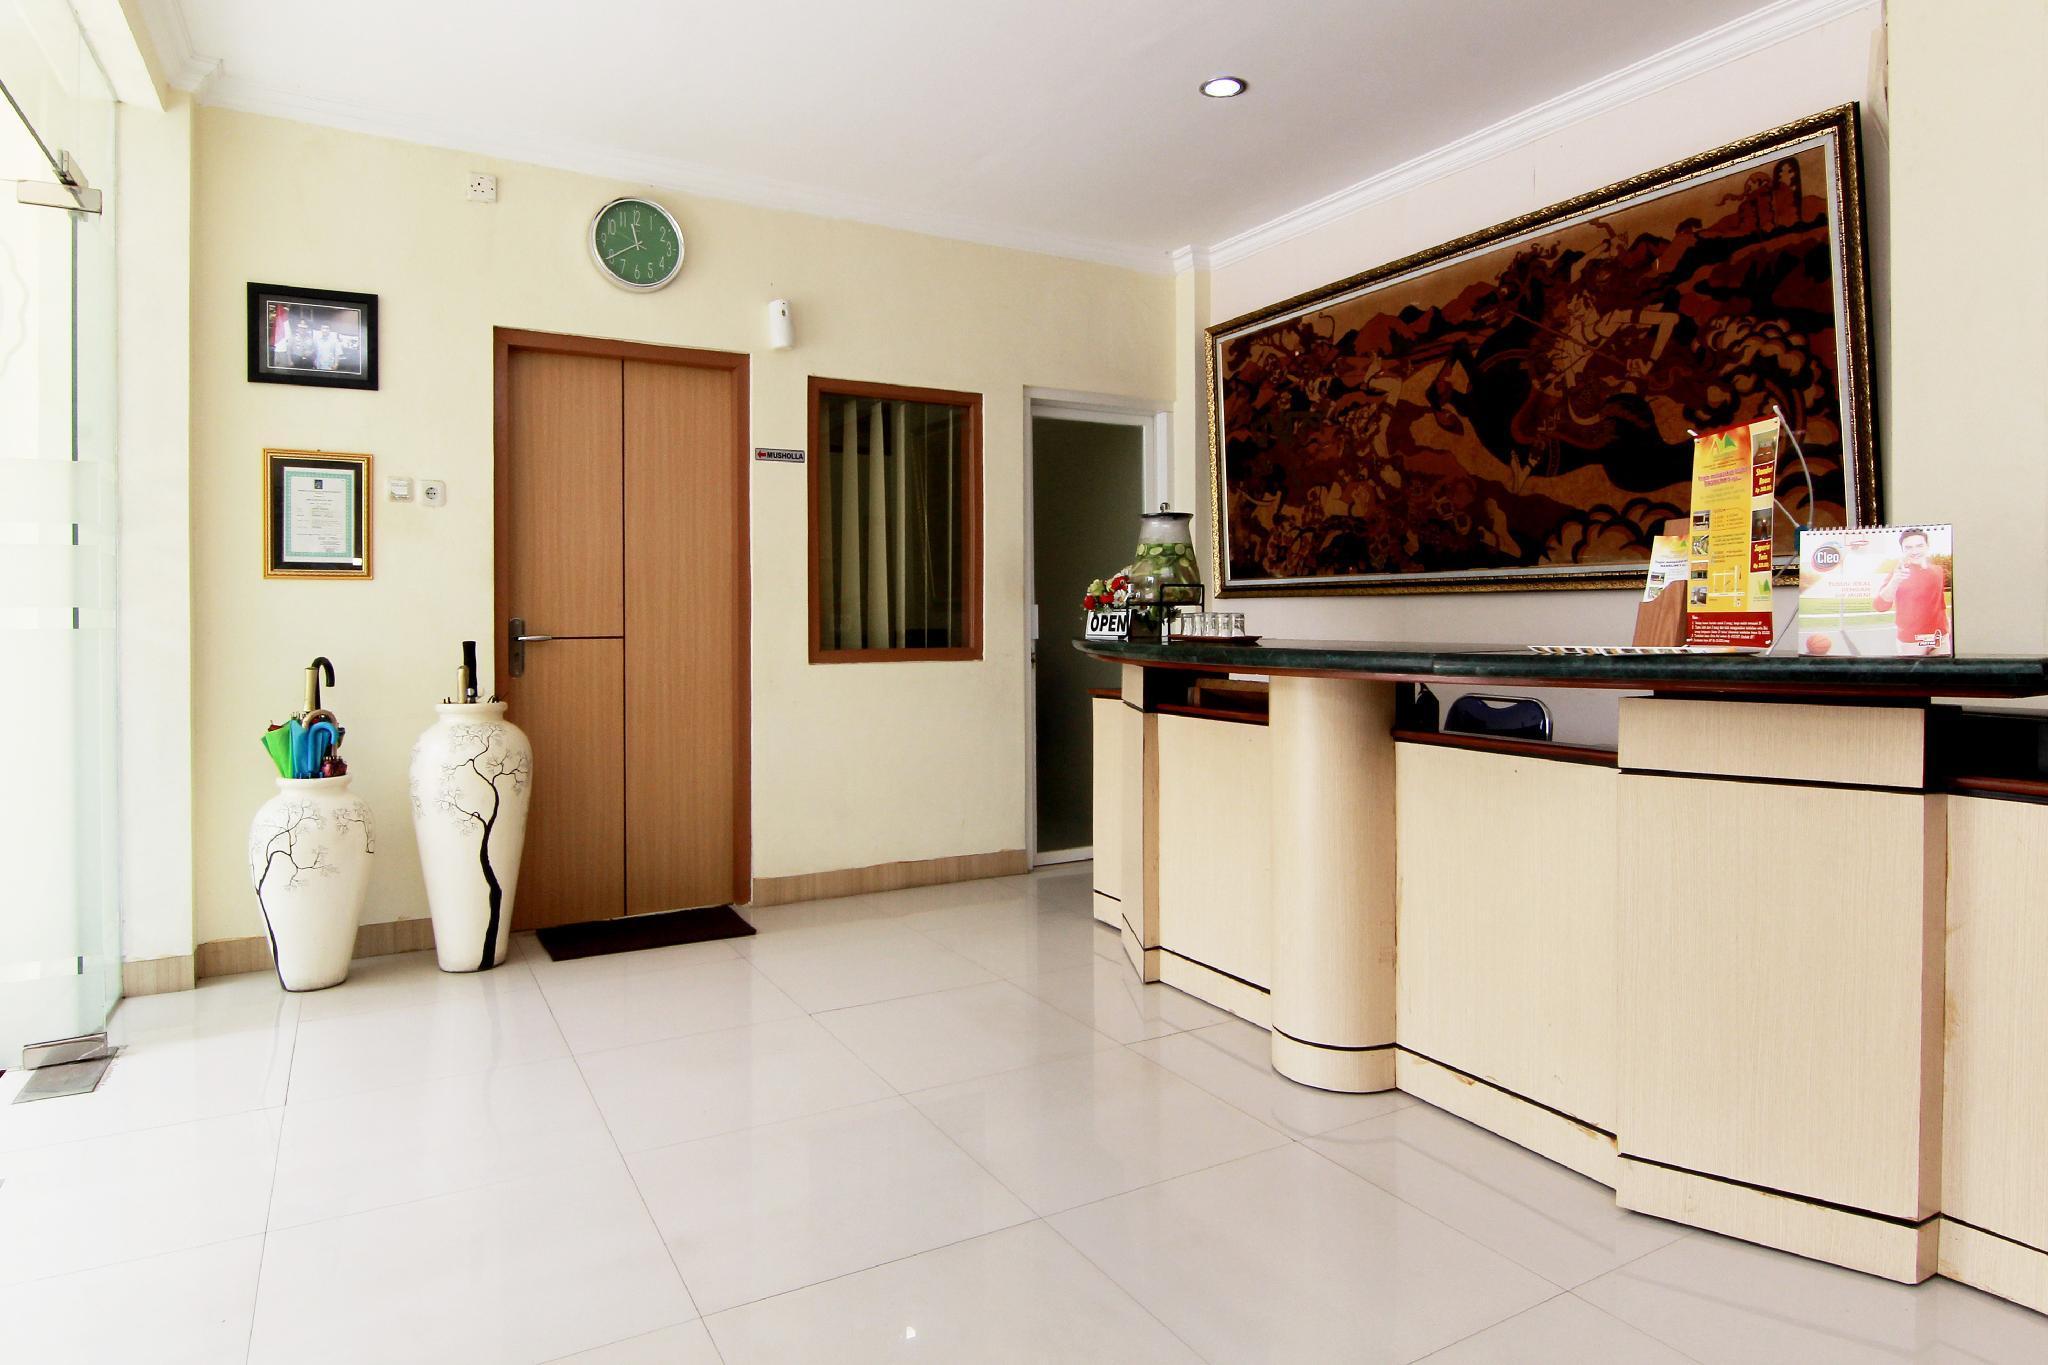 Masrilinks Guesthouse